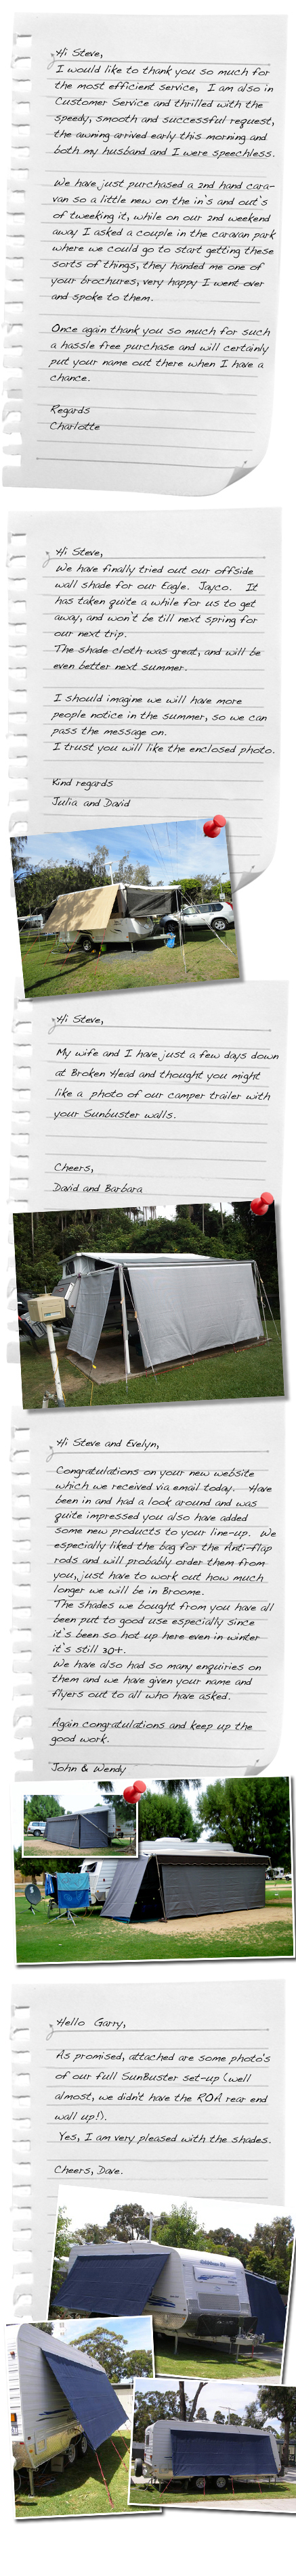 New Caravan Testimonials